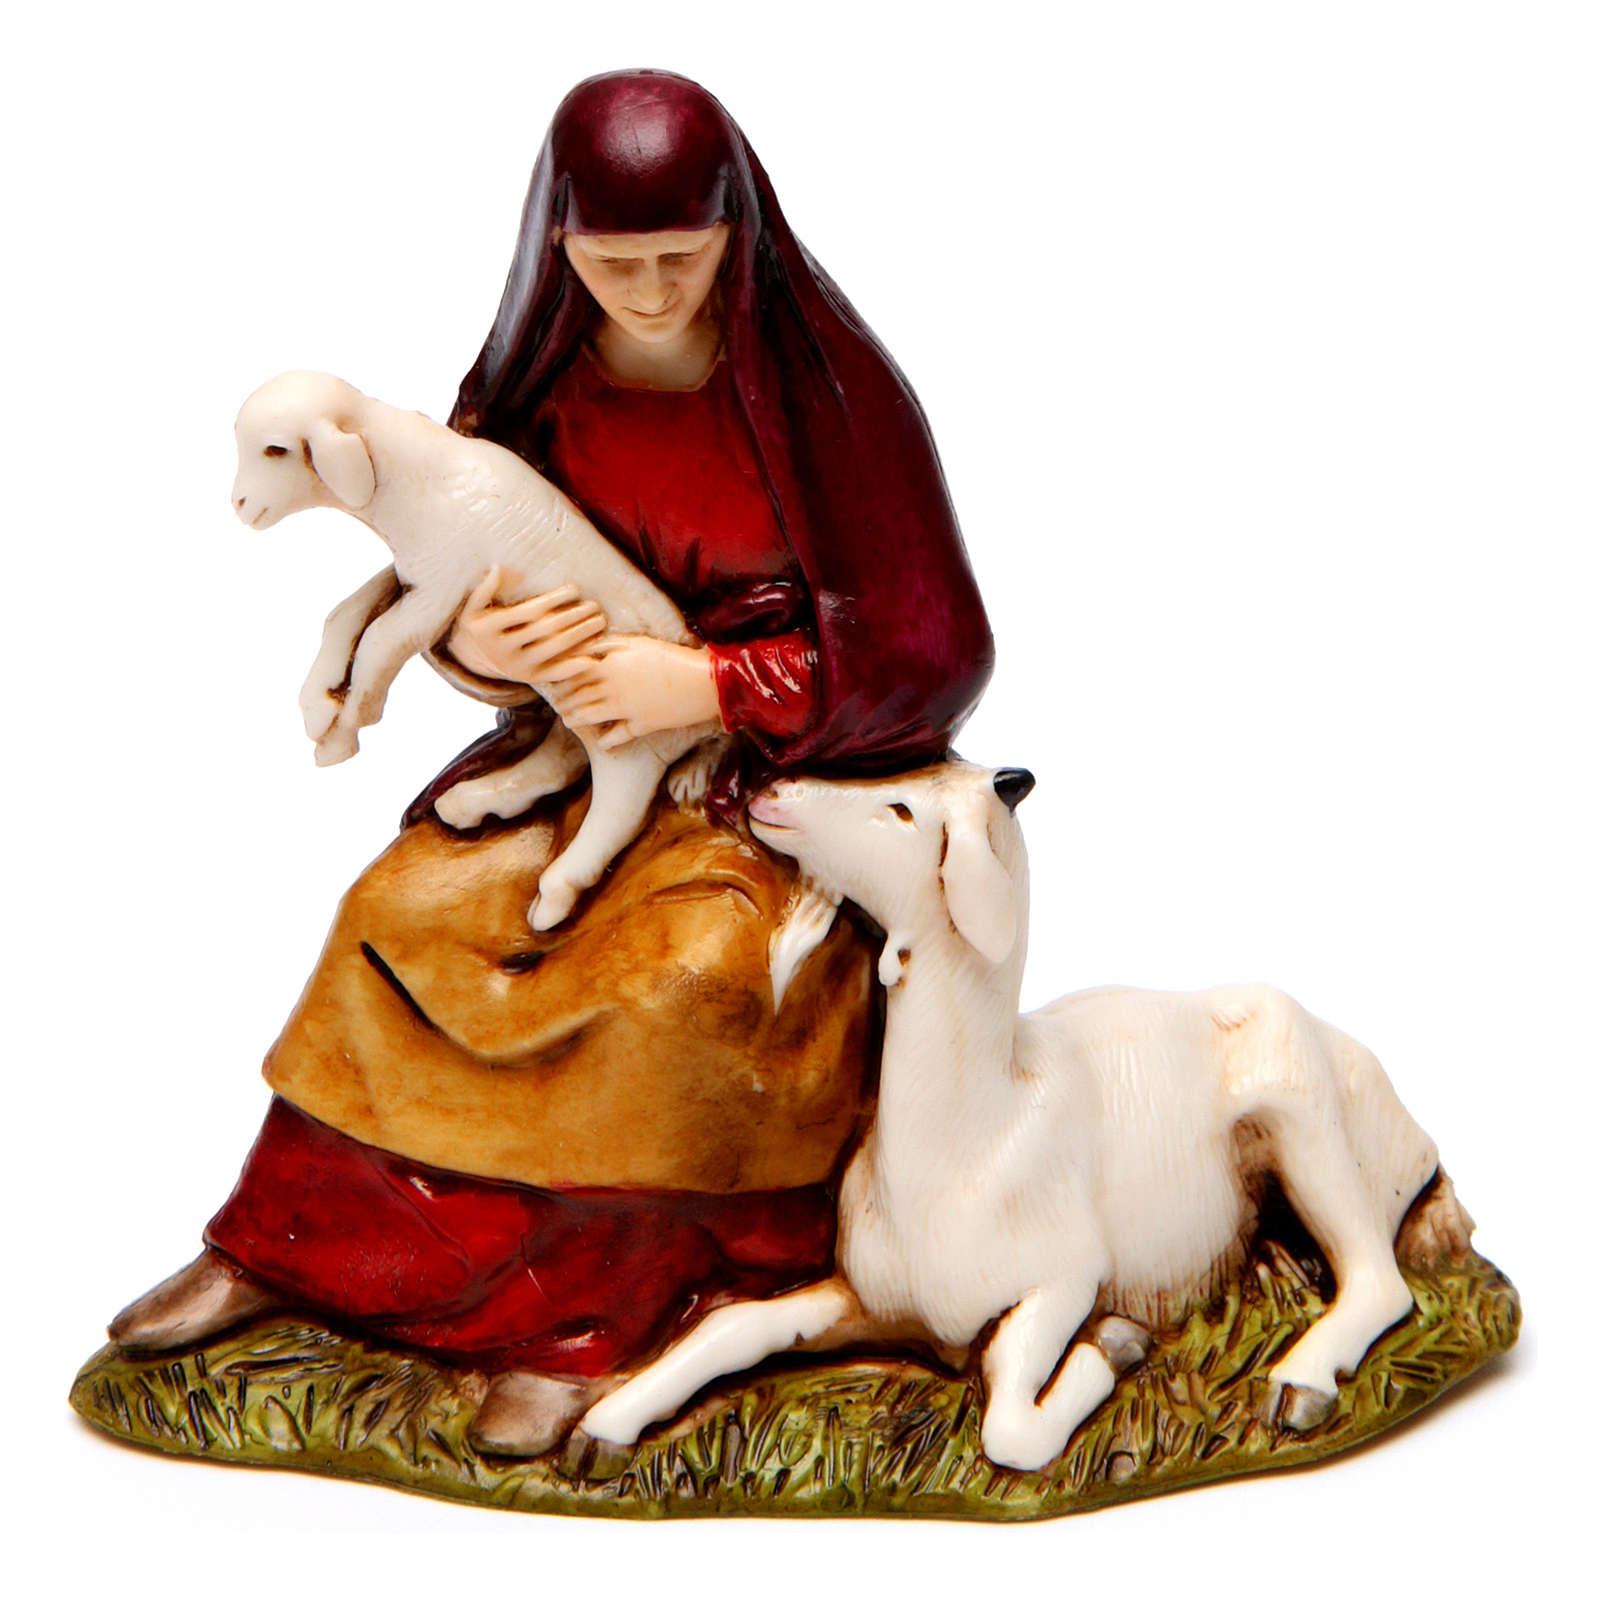 Gaitero asombrado mujer con cabra 8 cm Moranduzzo estilo histórico 4